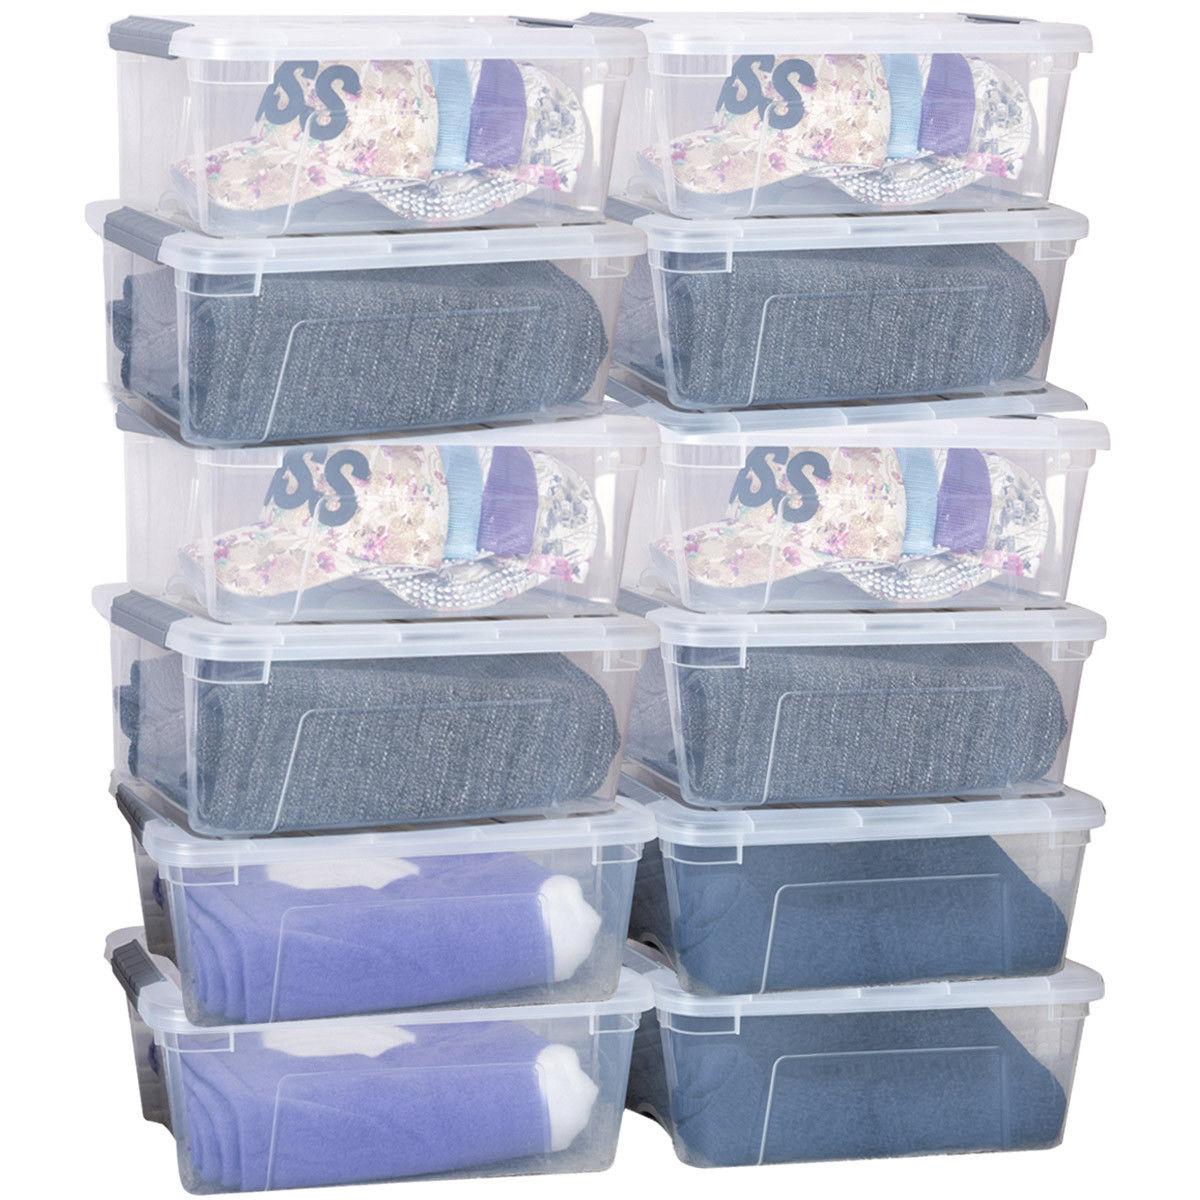 Costway 12 Pack Latch Stack Storage Box Tubs Bins Latches Handles